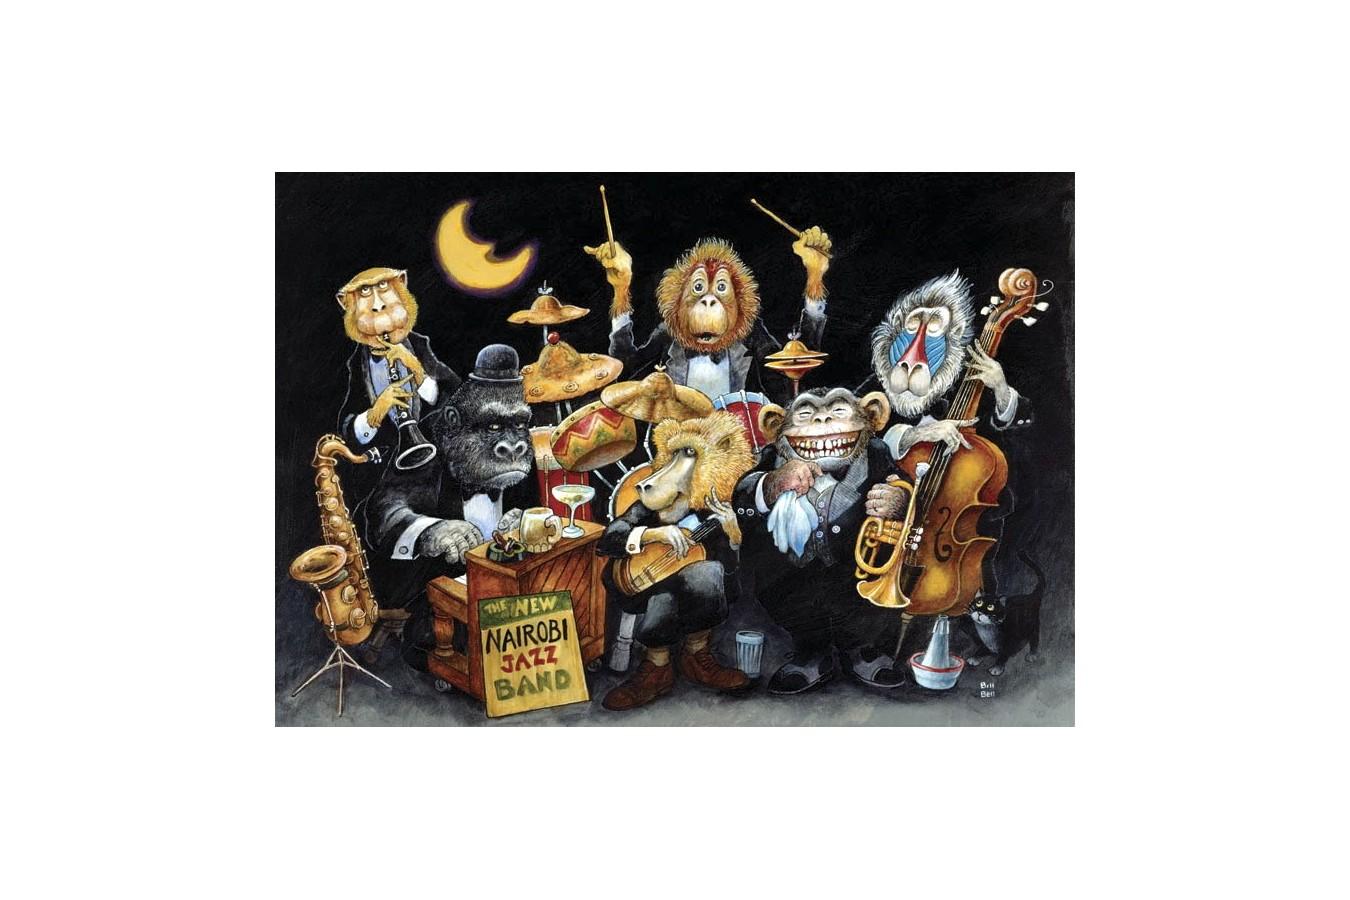 Puzzle Anatolian - The New Nairobi Jazz Band, 500 piese (3580) imagine